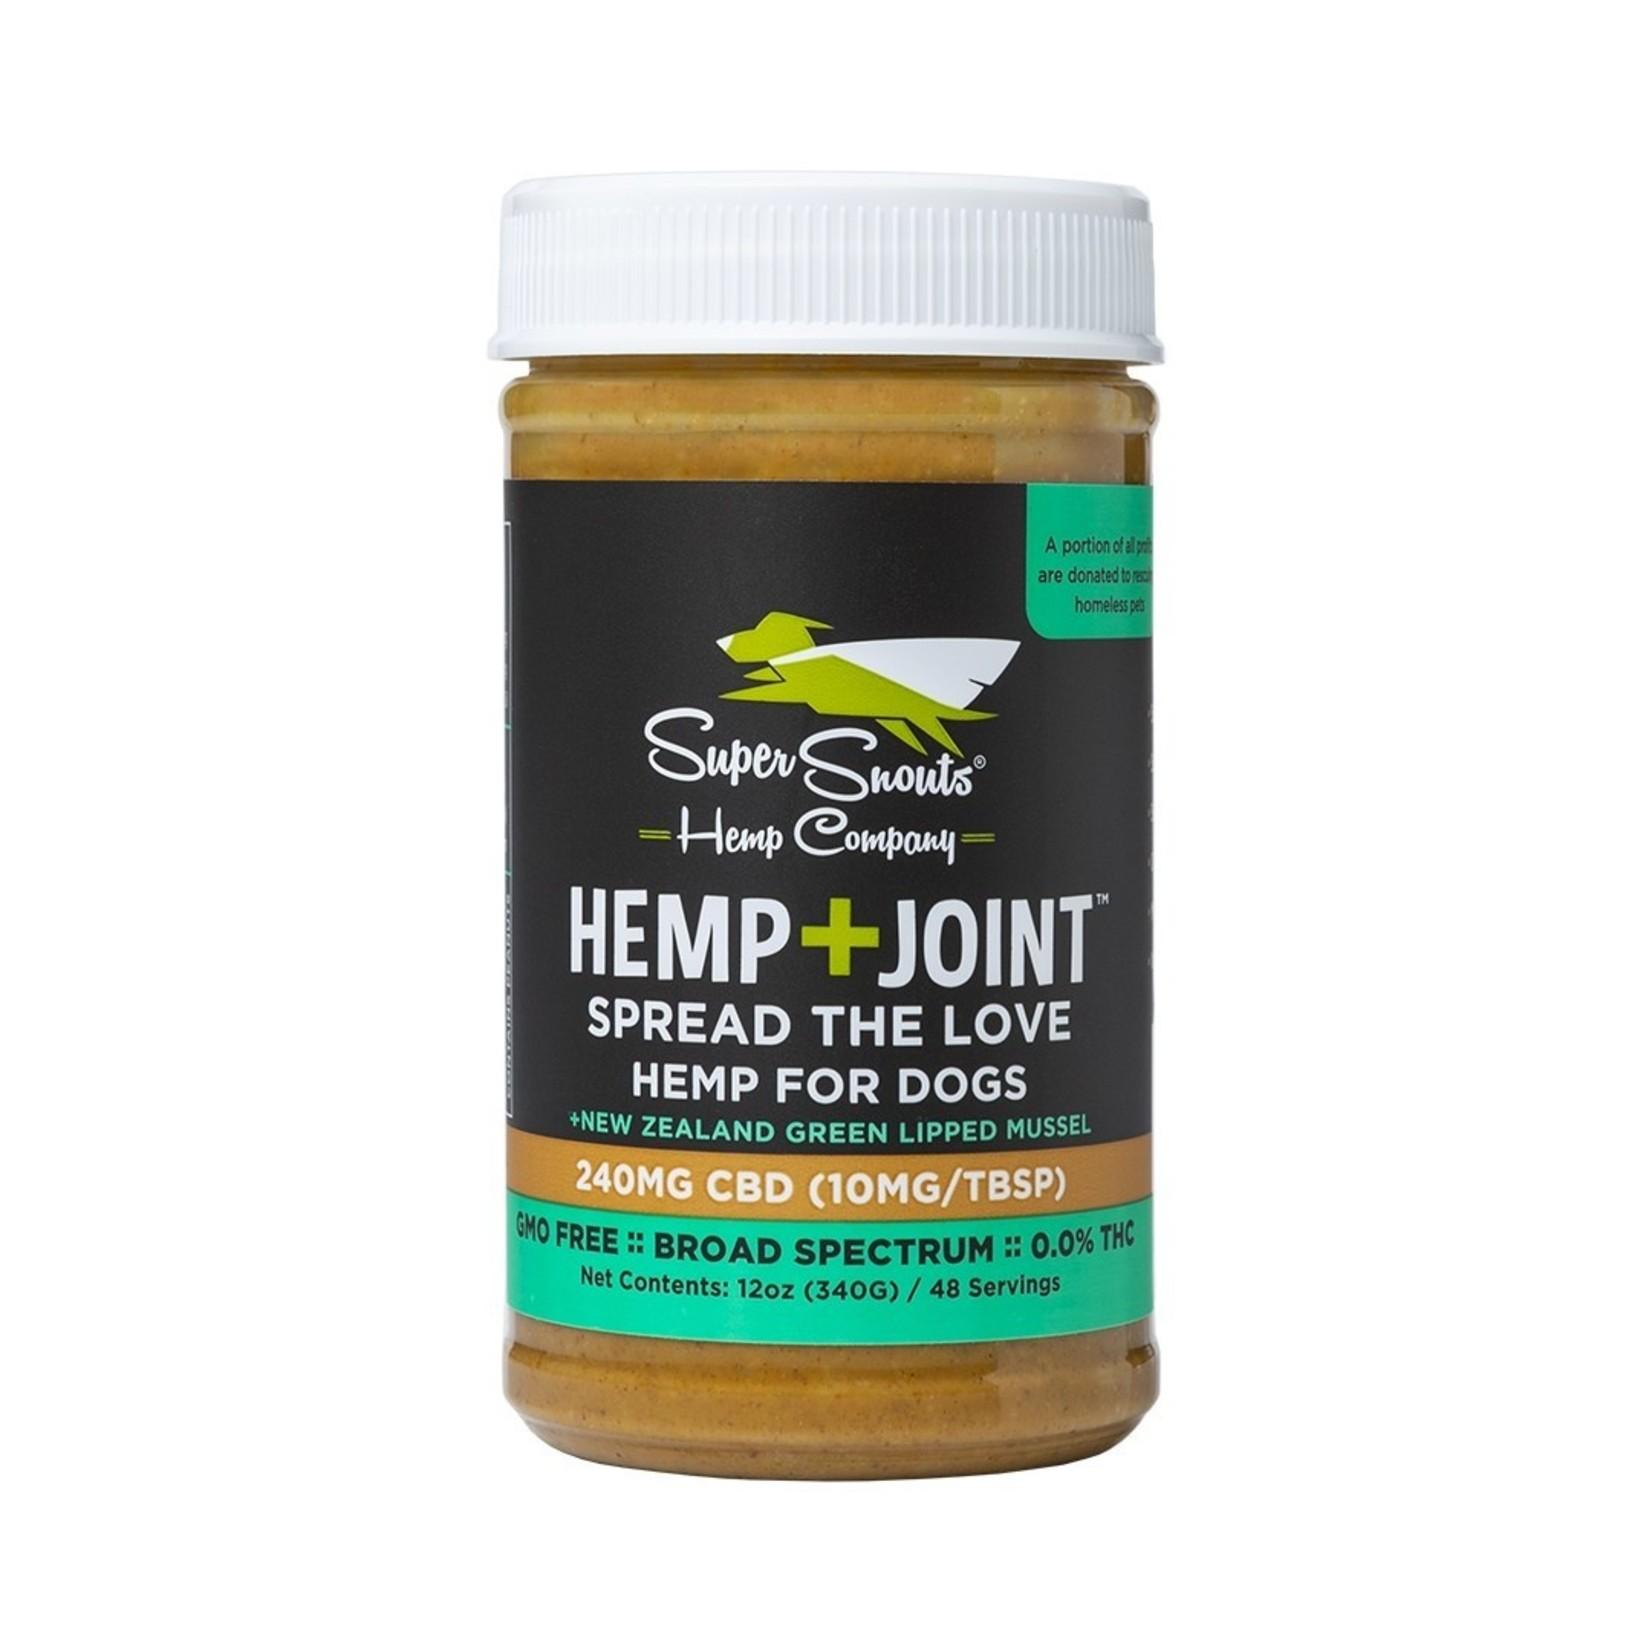 Diggin' / Super Snouts Super Snouts CBD Hemp & Joint Peanut Butter 12 OZ